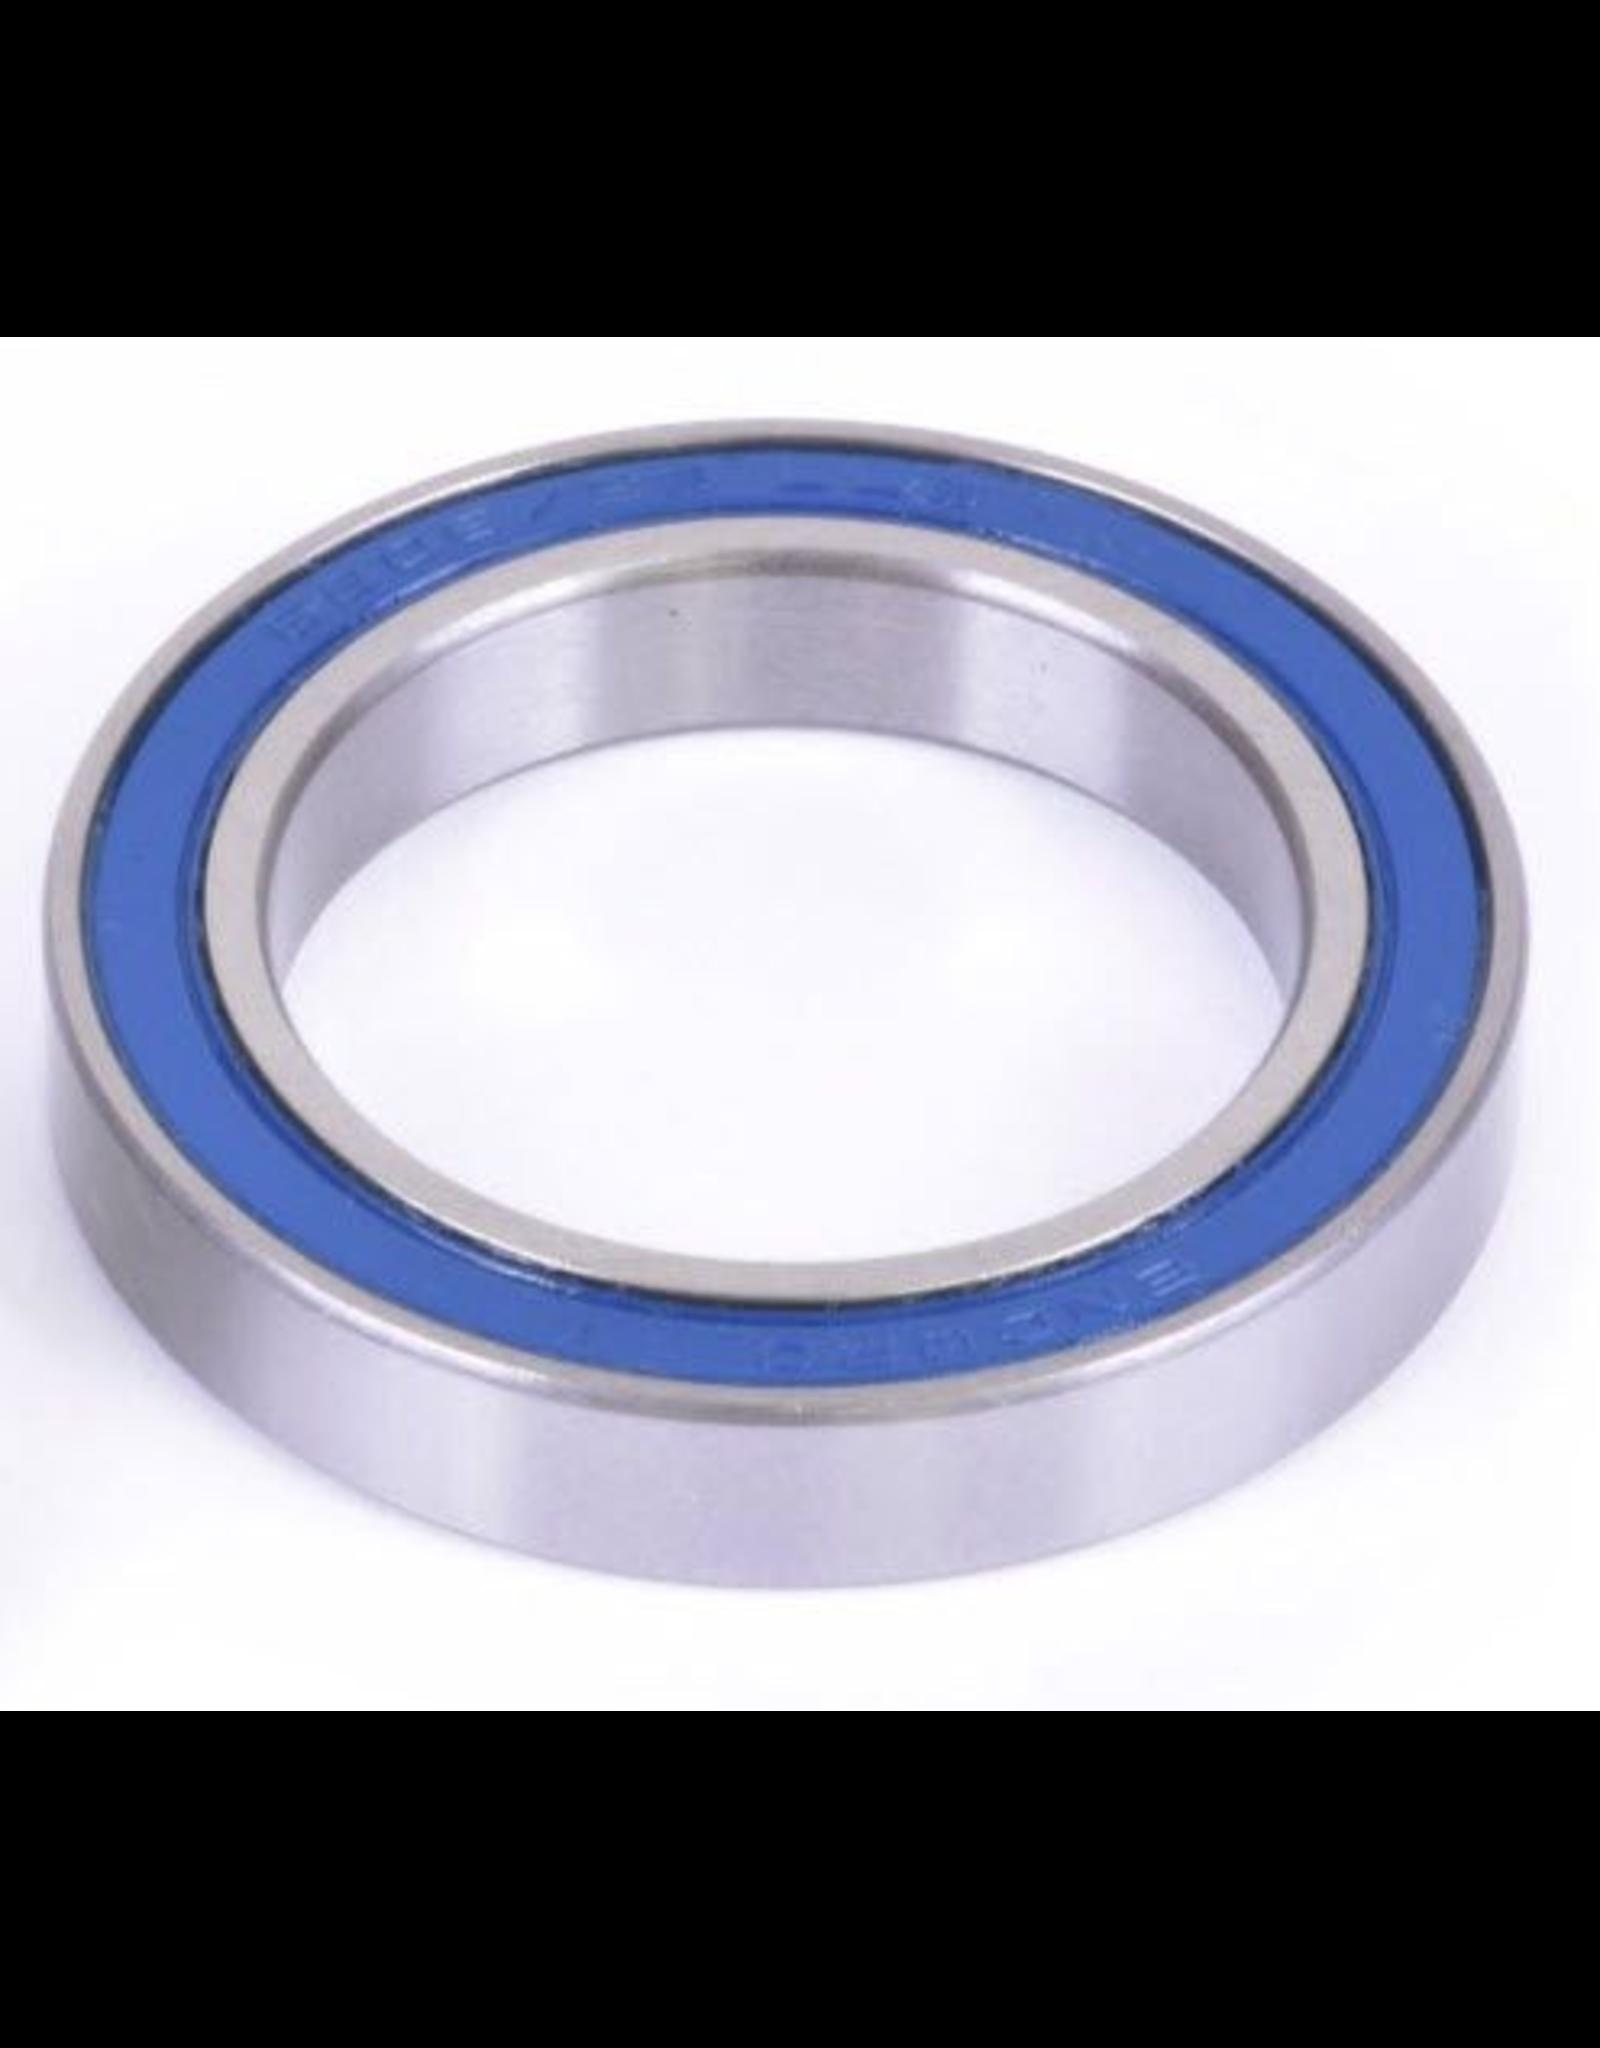 Enduro Enduro MR 2437 ABEC-3 Steel Bearing /each (24mm x 37mm x 7mm - BSA 24mm)